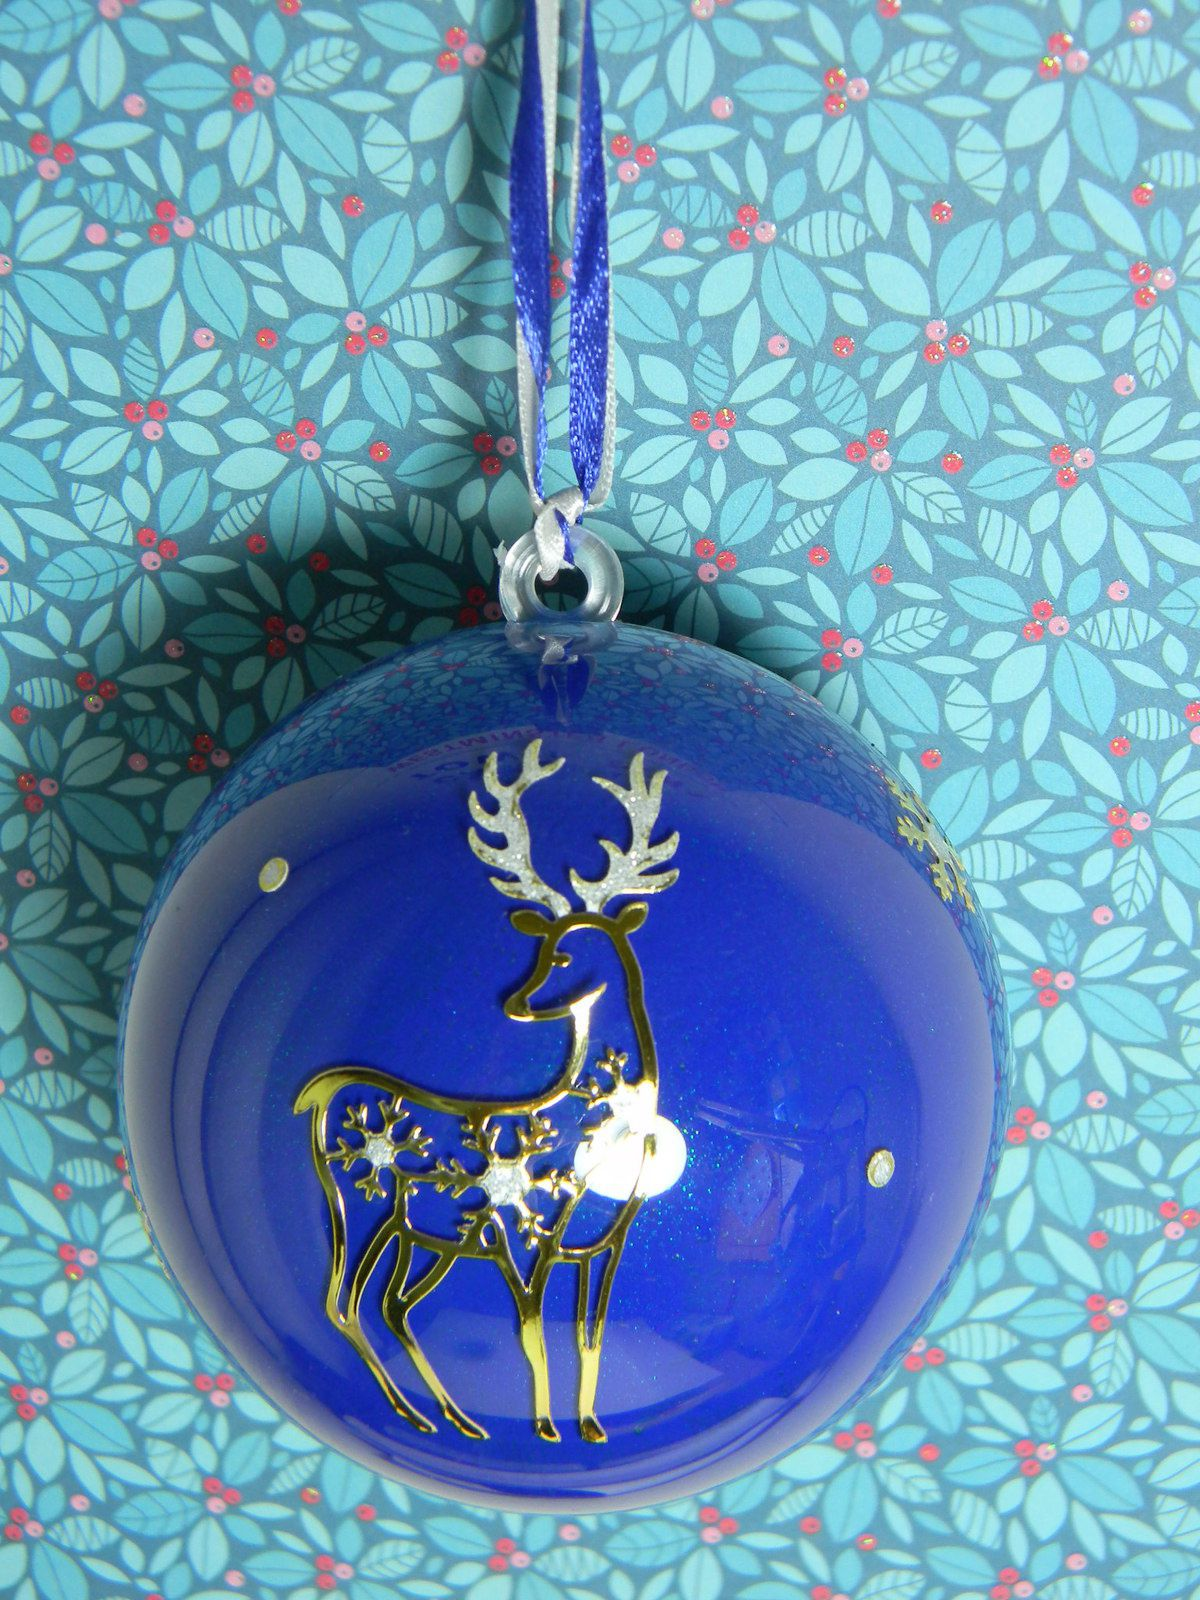 Tuto DIY boules de Noël express !